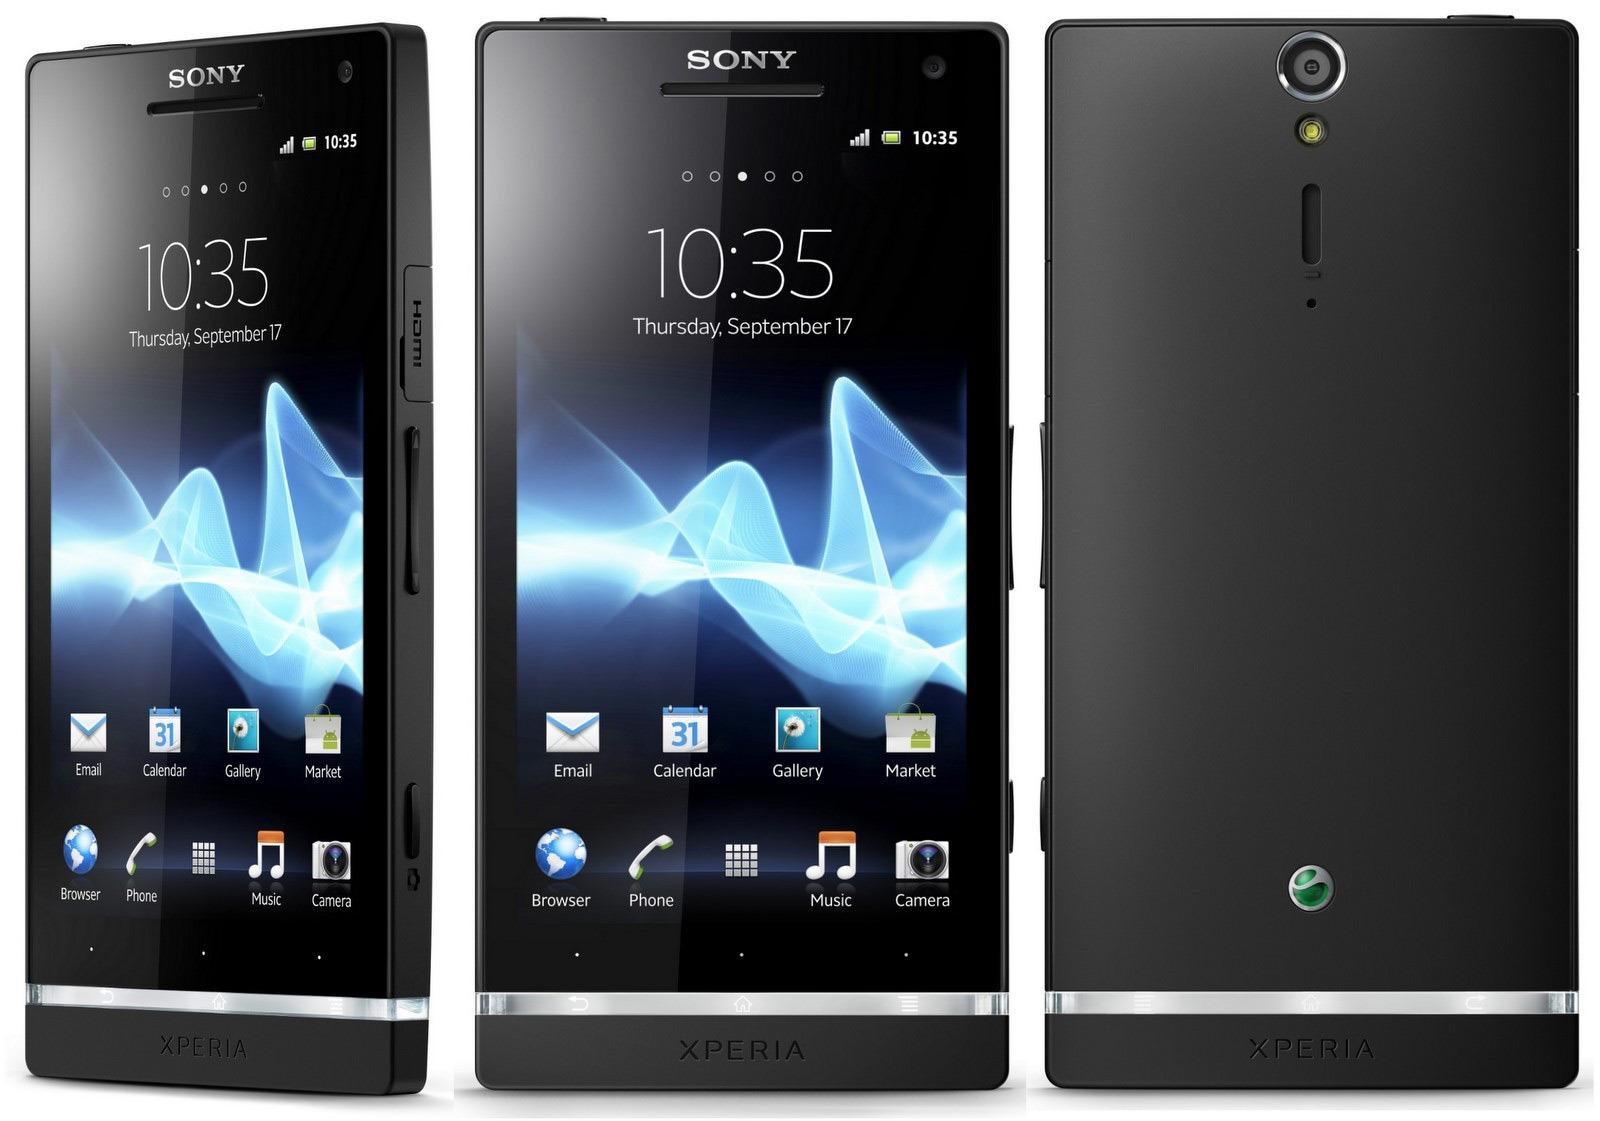 Обнародованы технические характеристики Sony Xperia XZ и Xperia X Compact